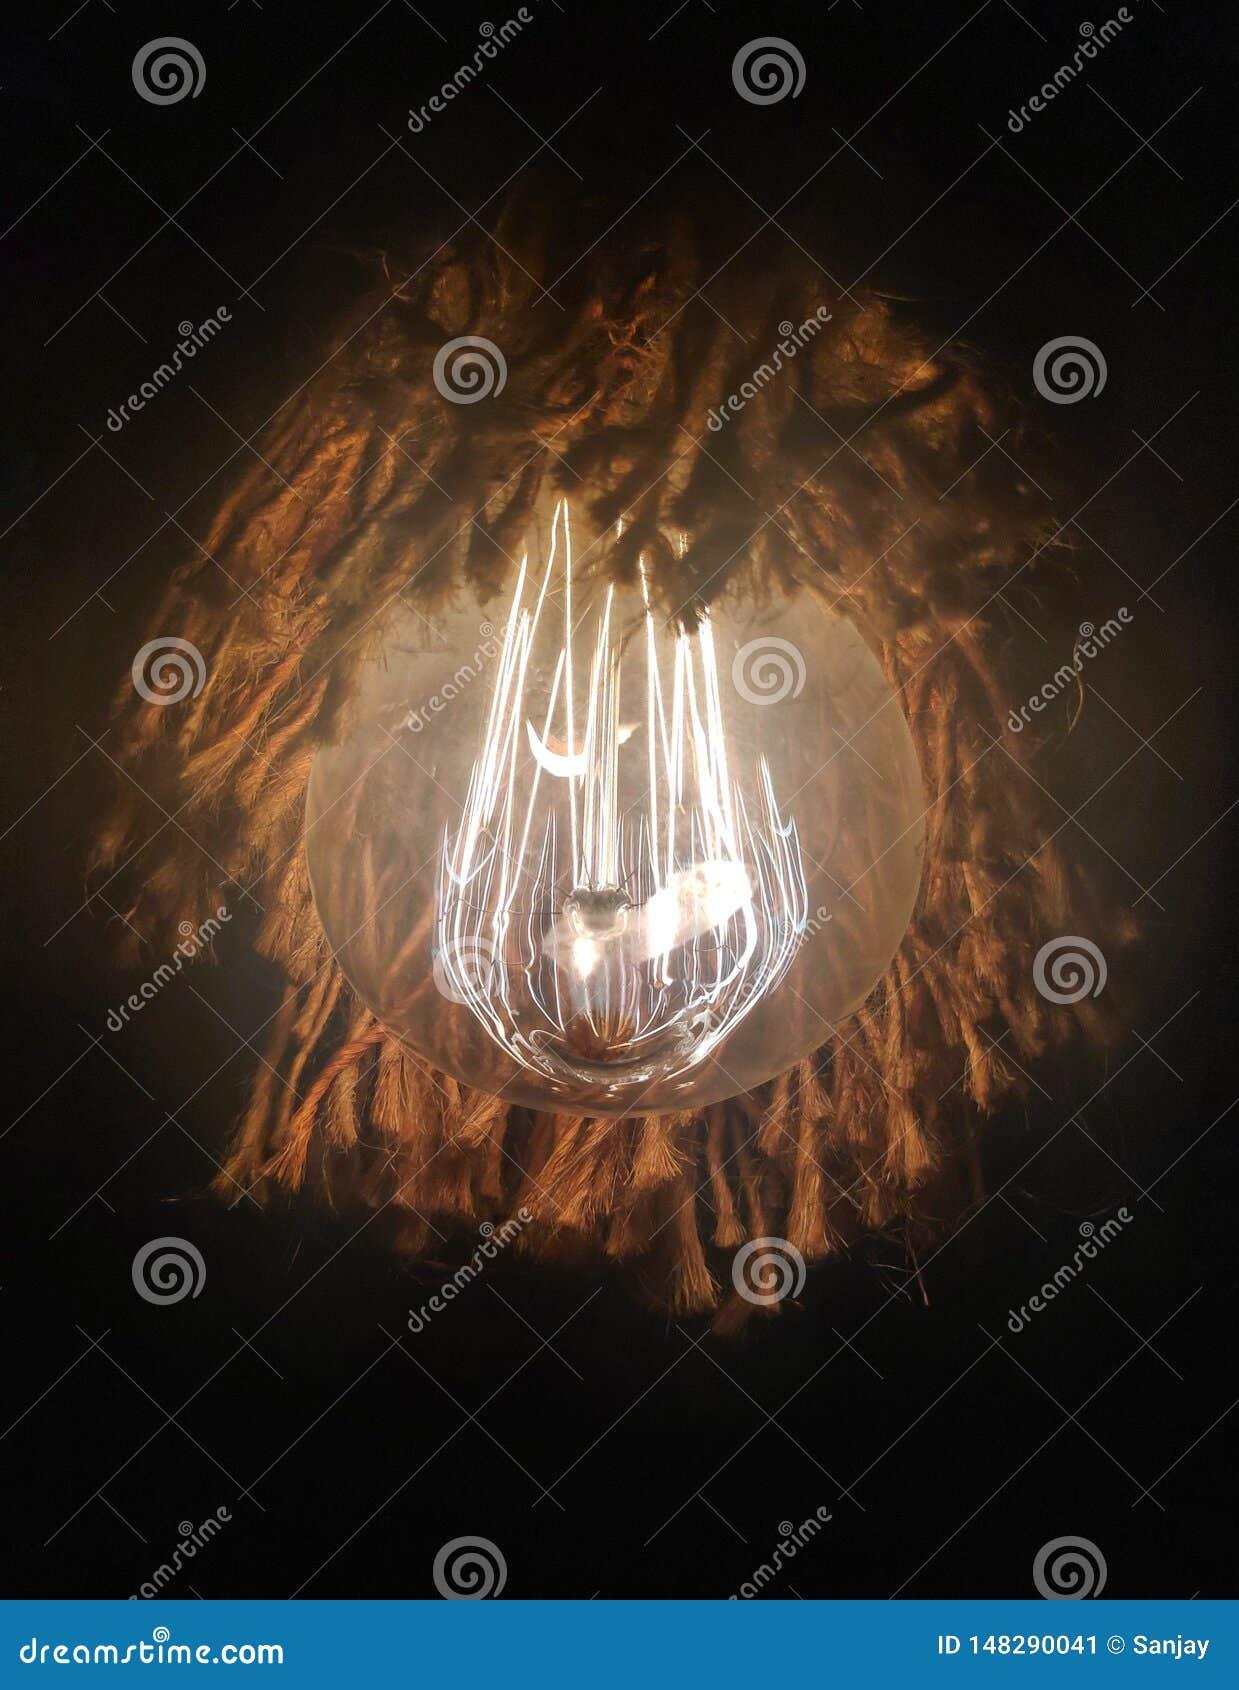 Dekorativ ljus kula som fixas inom rep